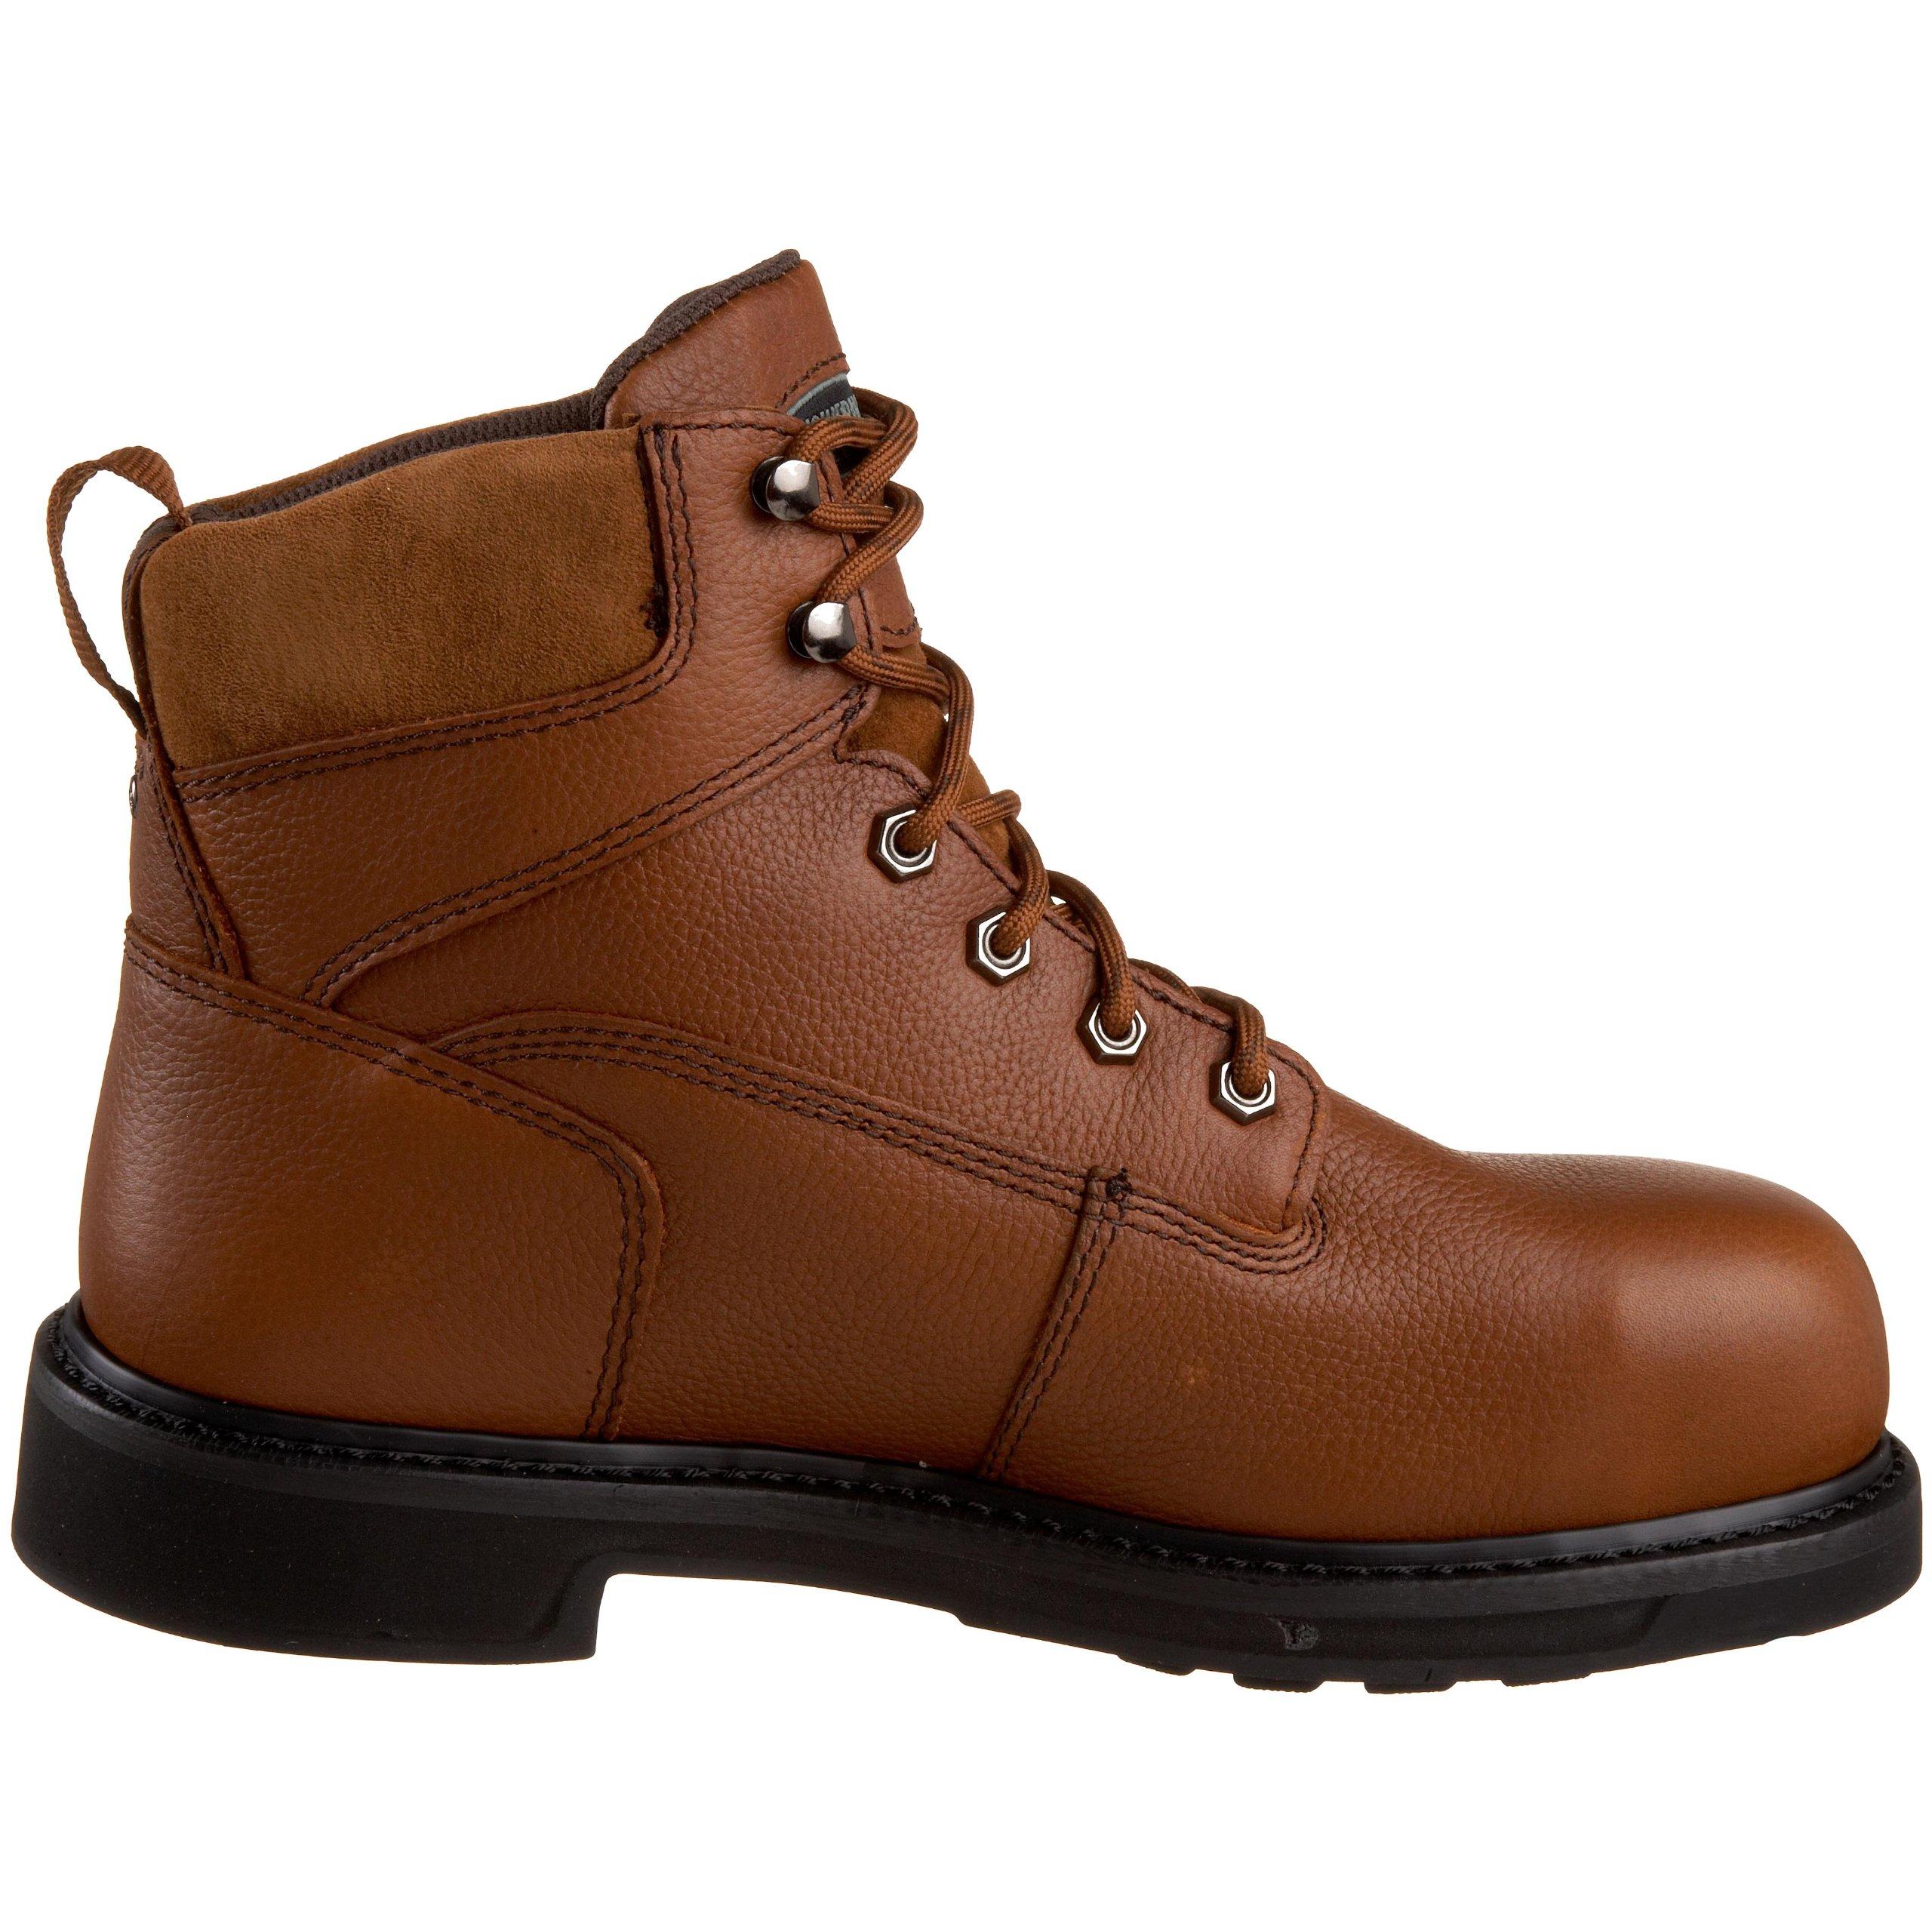 Wolverine Men's W02564 Durashock Boot, Brown, 7 M US by Wolverine (Image #6)